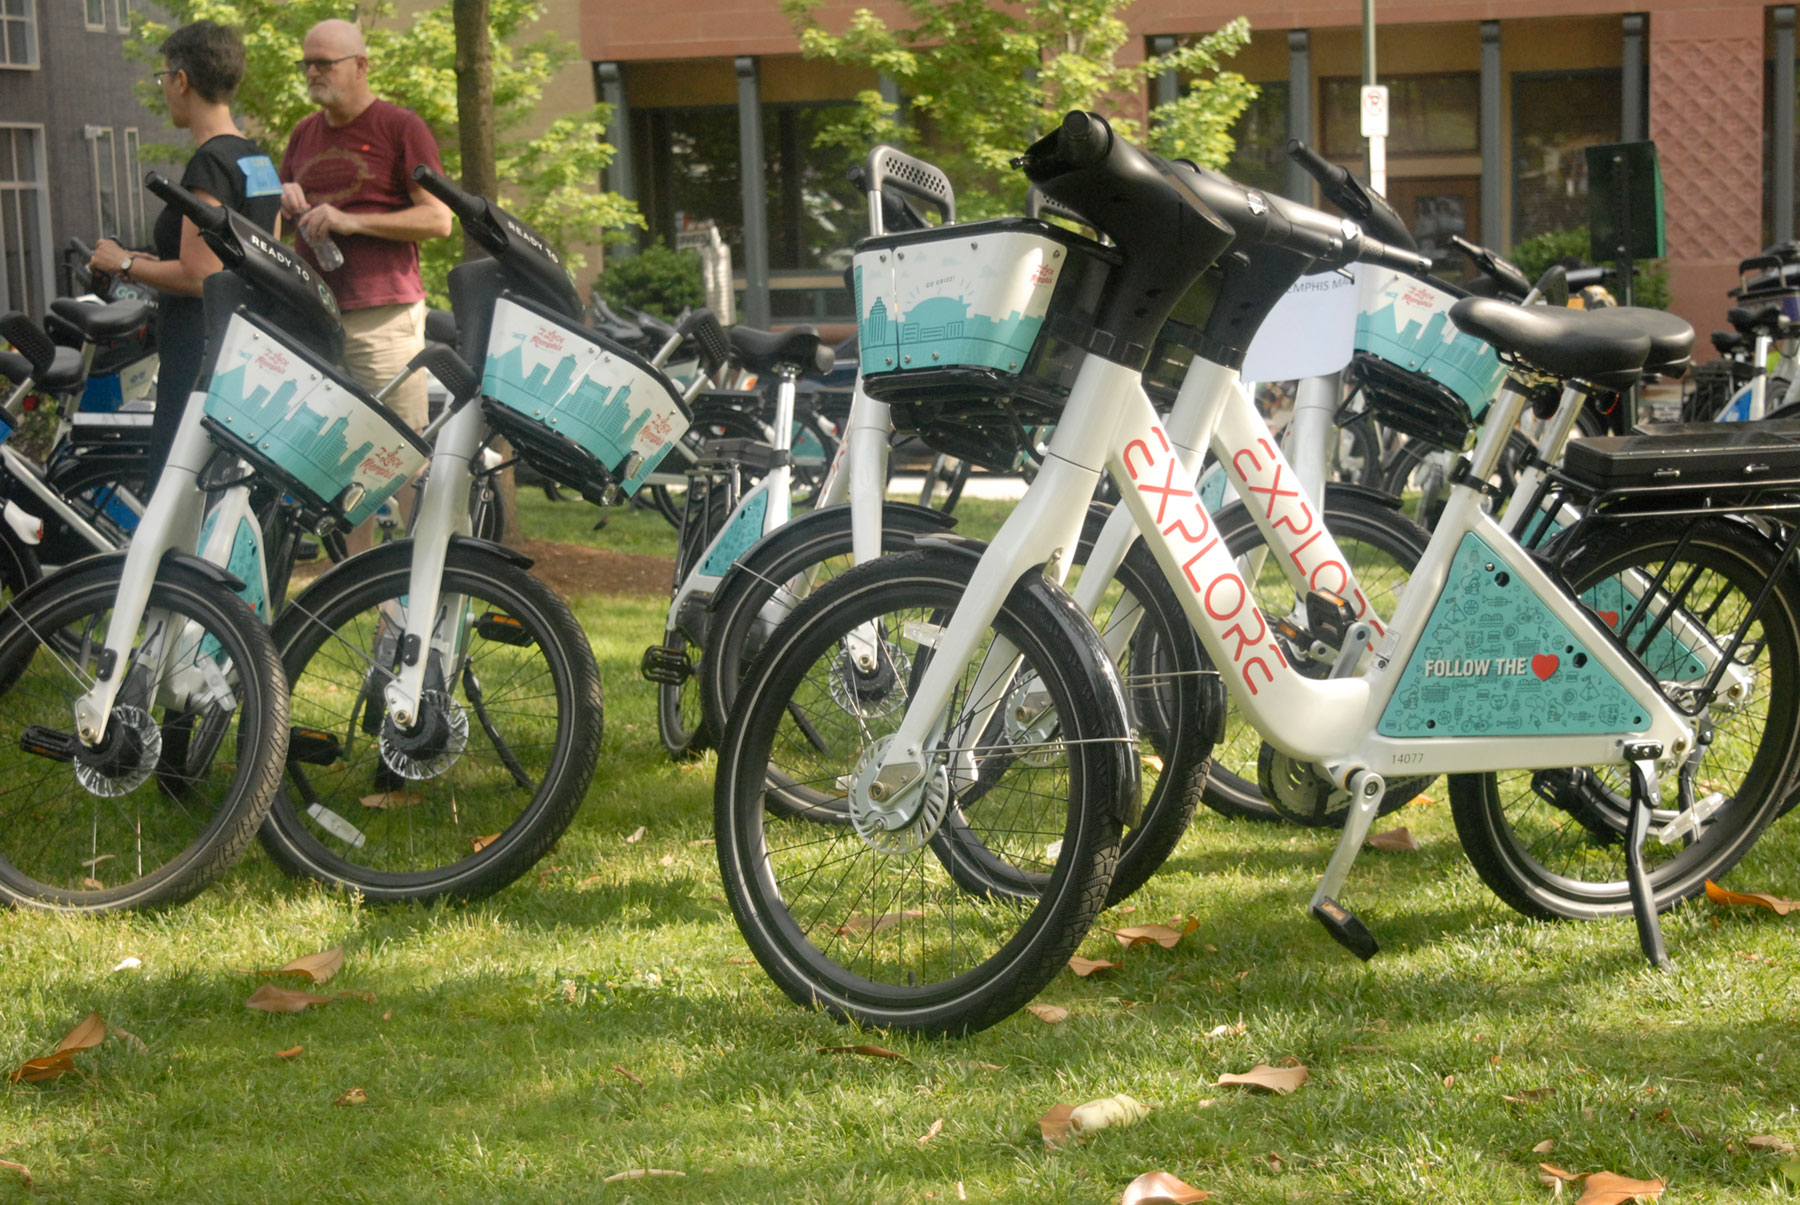 Explore-Bike-Share_Bike-Wrap_Memphis-Zoo_GraphicWrap_LSIGraphics_Memphis-TN_2 ..